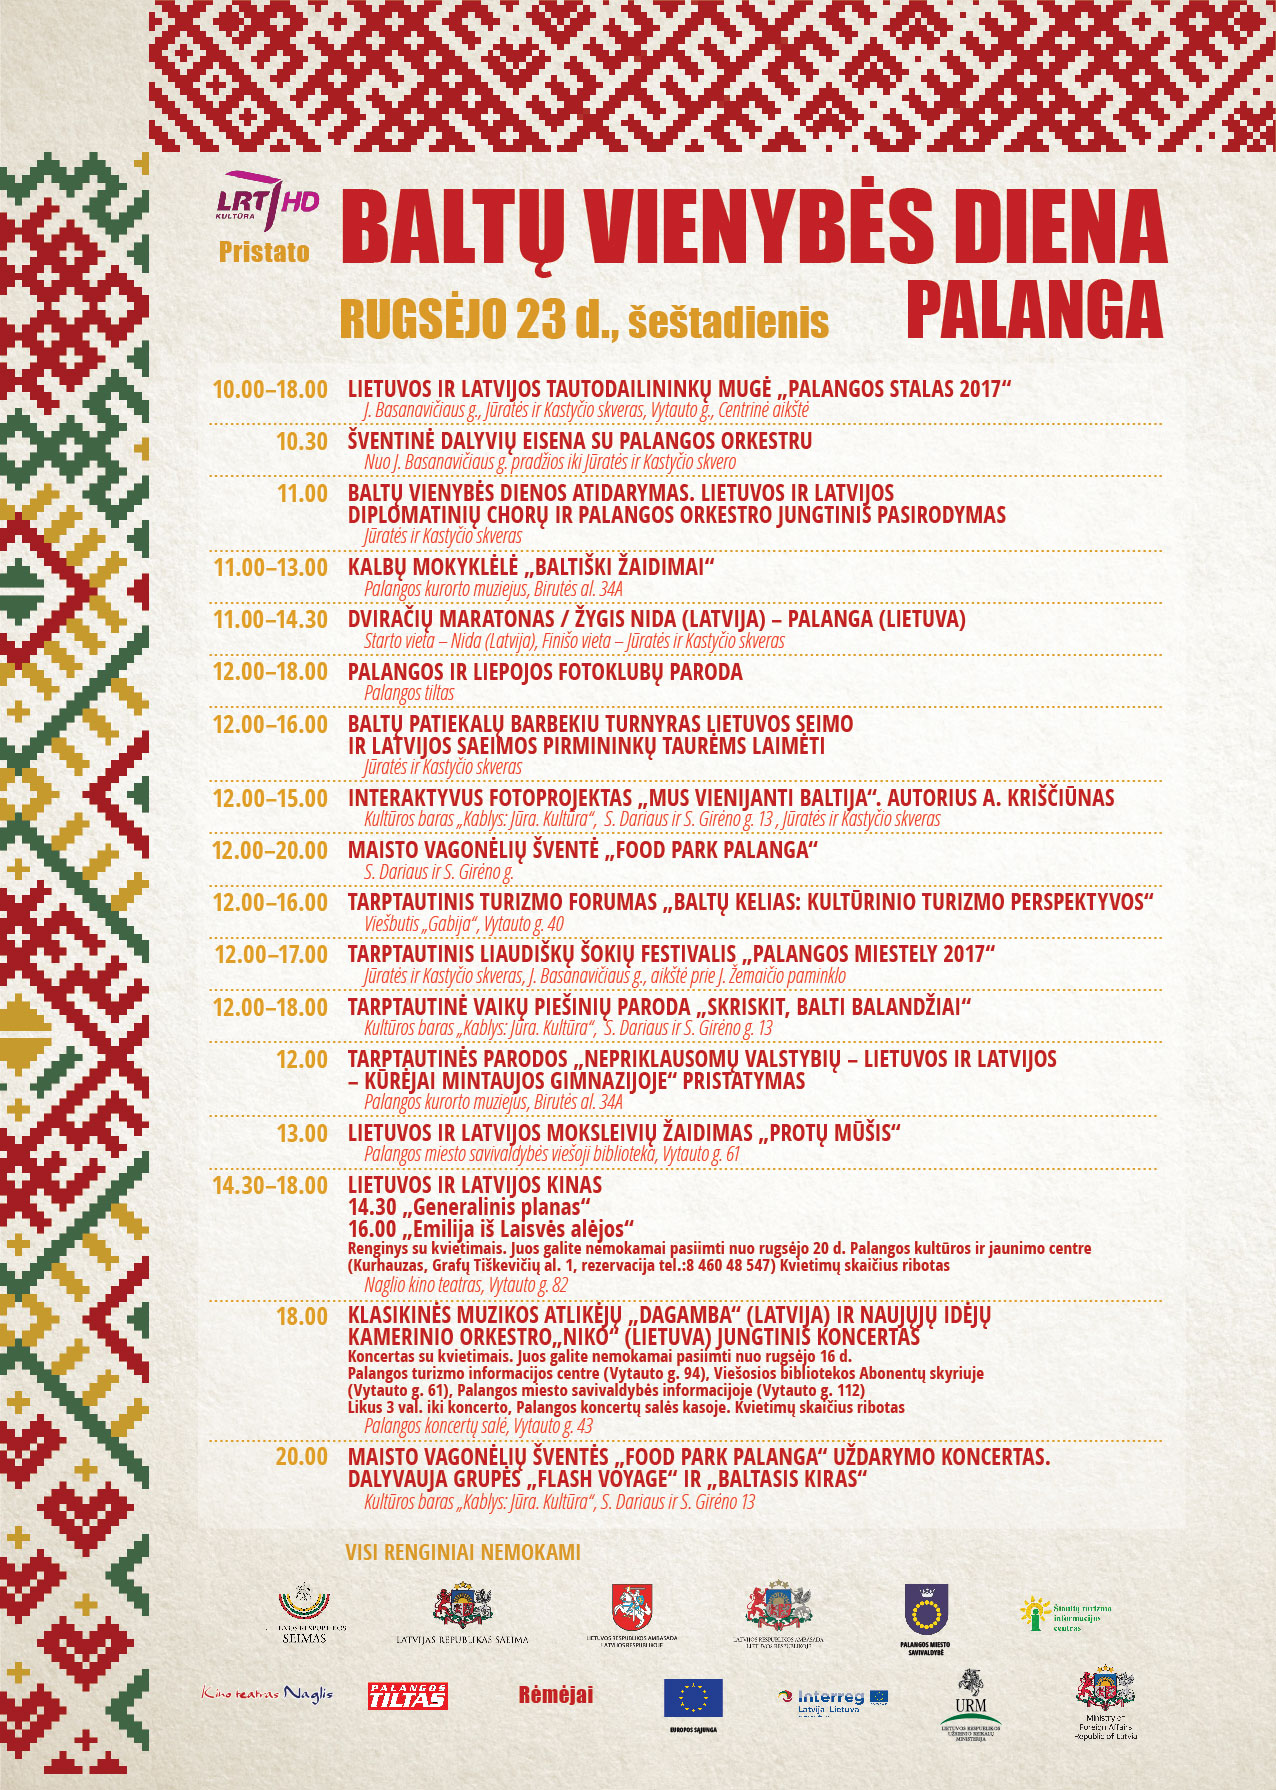 Baltu vienybes dienos programa Palangoje 2017 m.